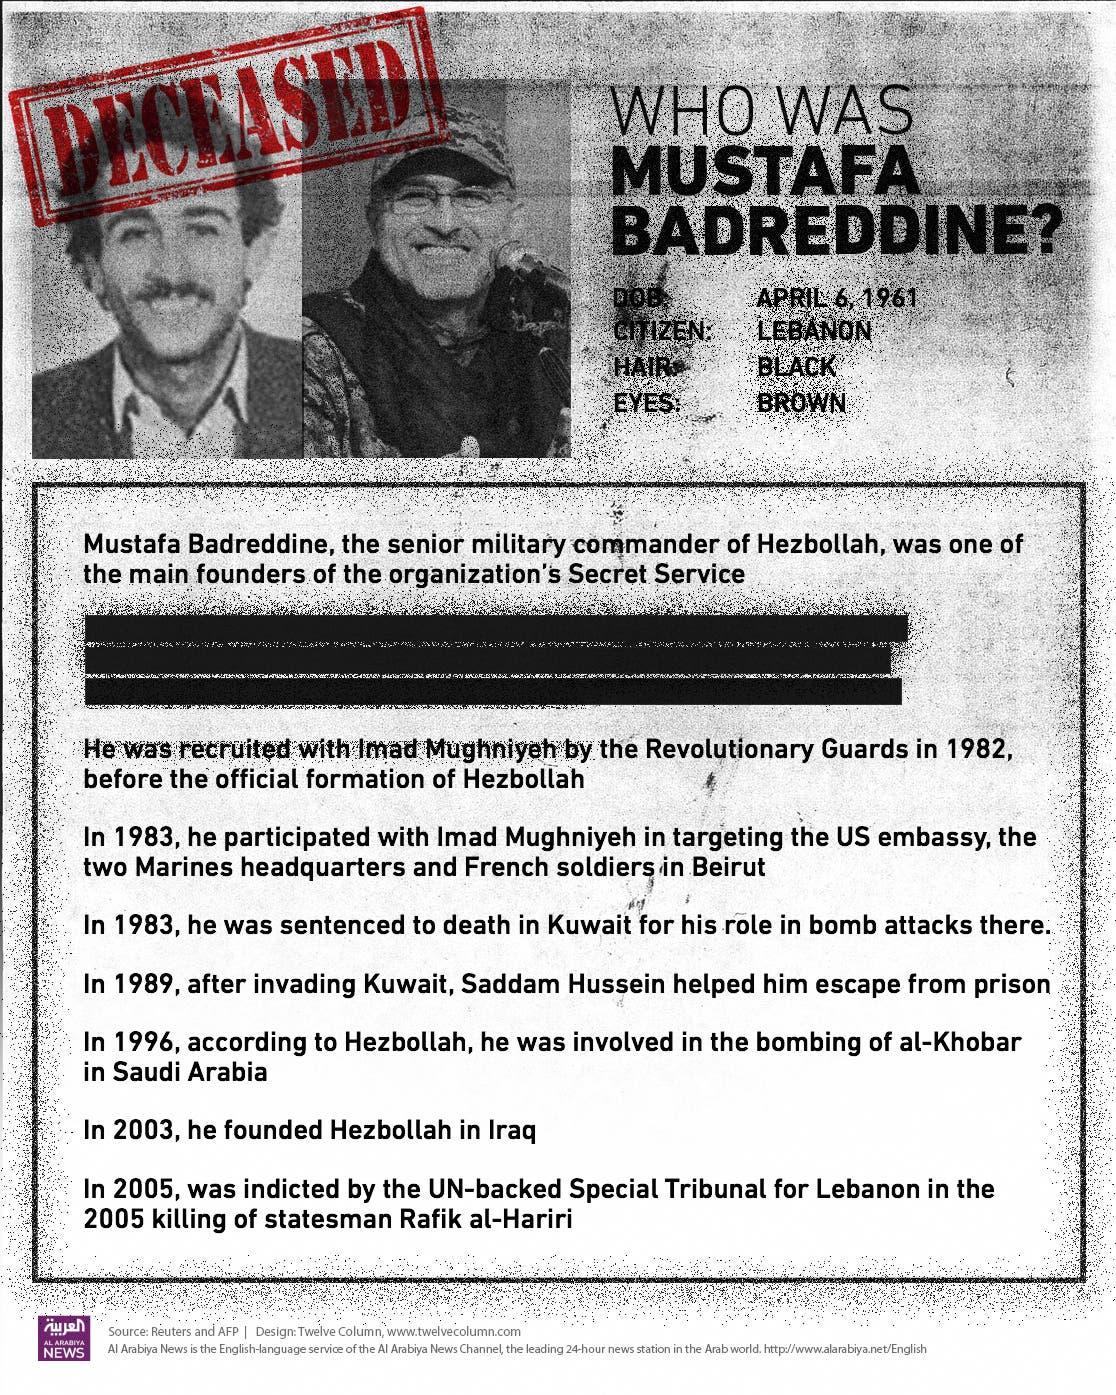 MUSTAFA BEDREDDINE HEZBOLLAH DEAD MAY 13, 2016 --